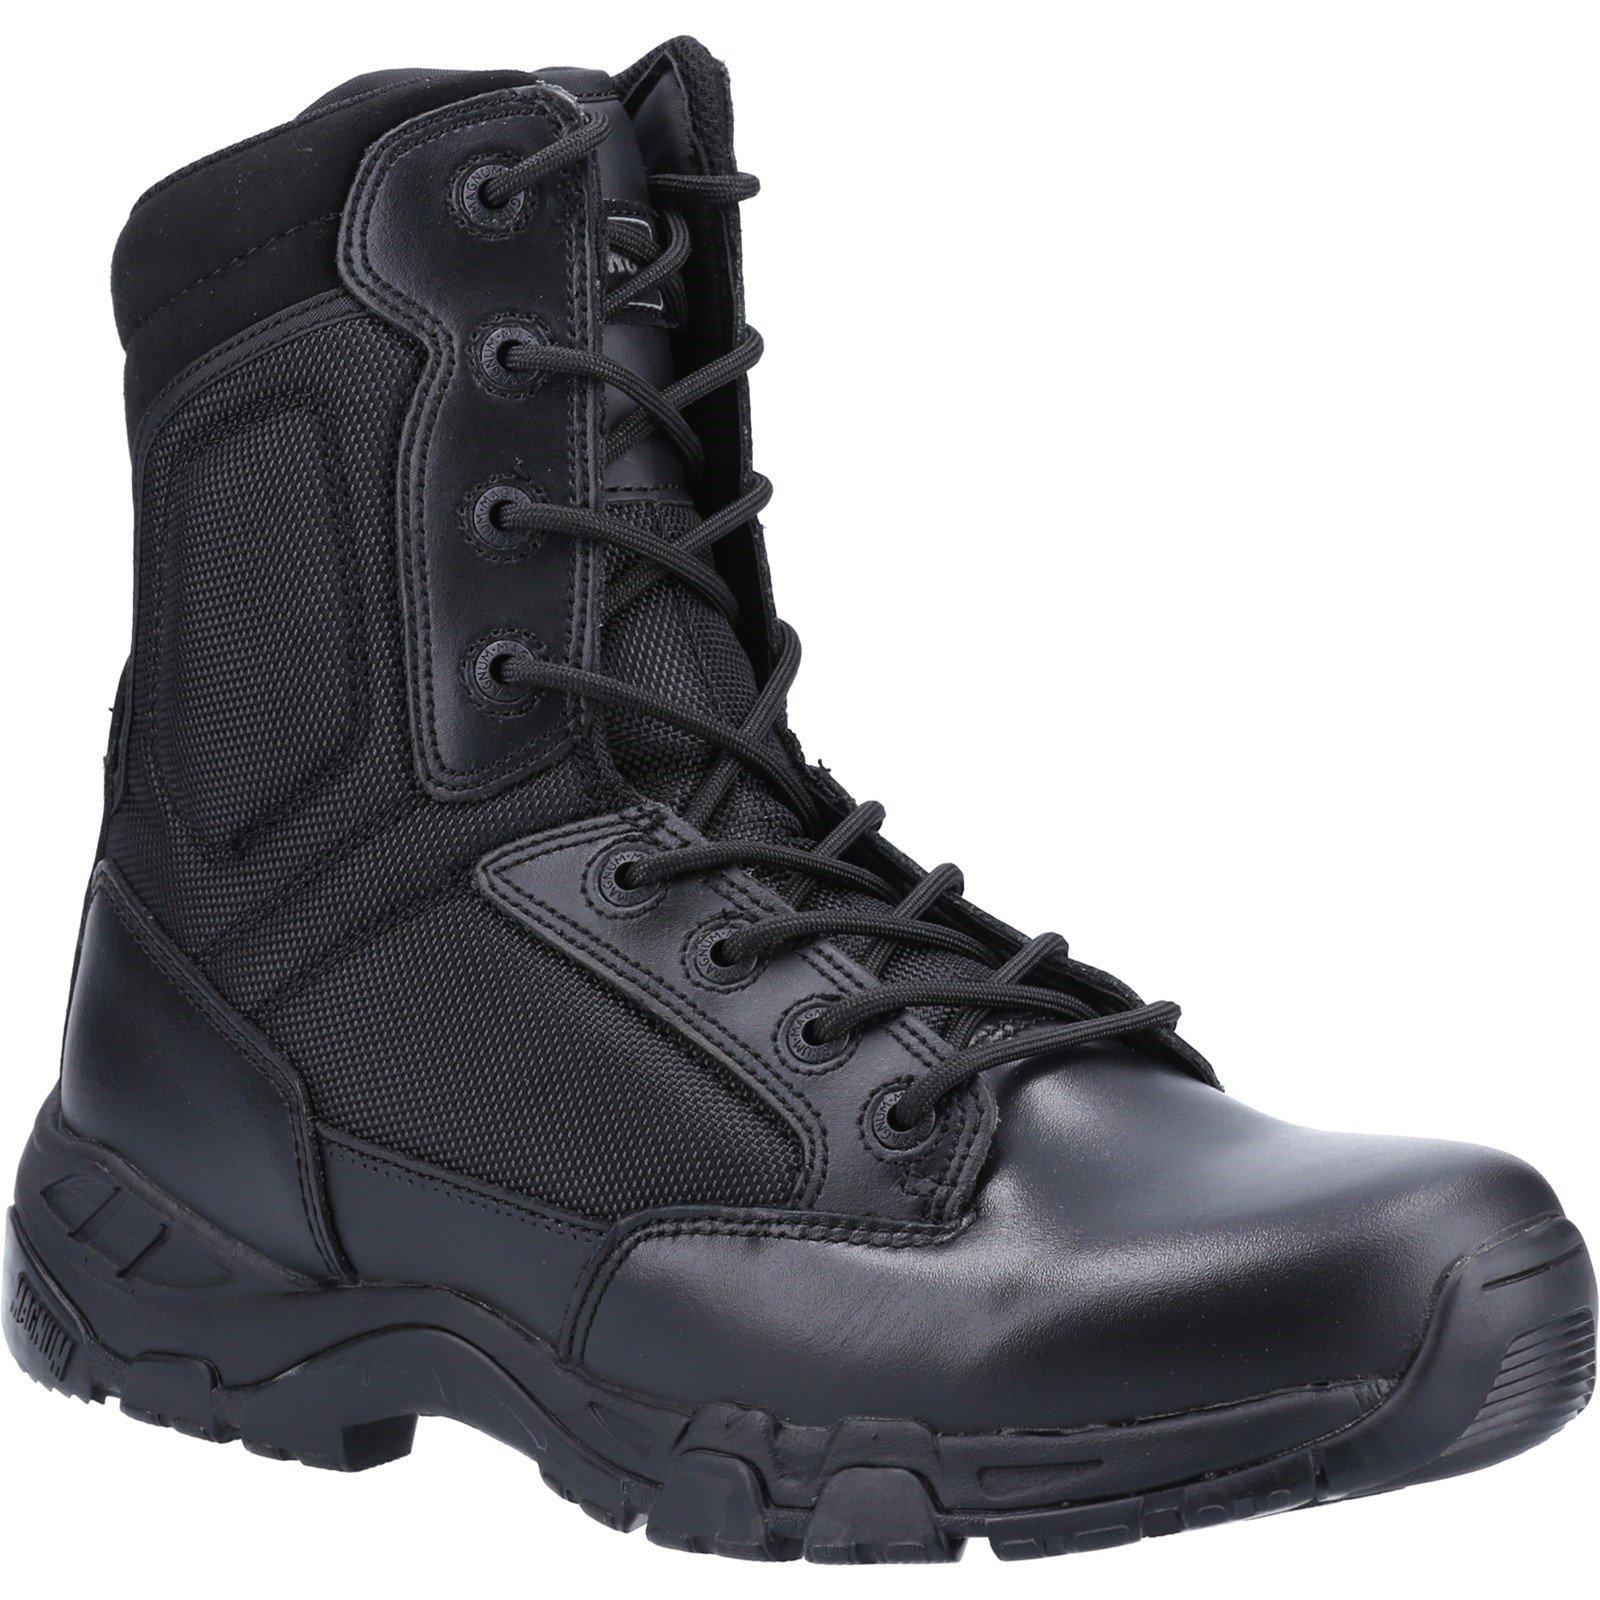 Magnum Unisex Viper Pro Plus Side-Zip Uniform Boot Black 33533 - Black 11